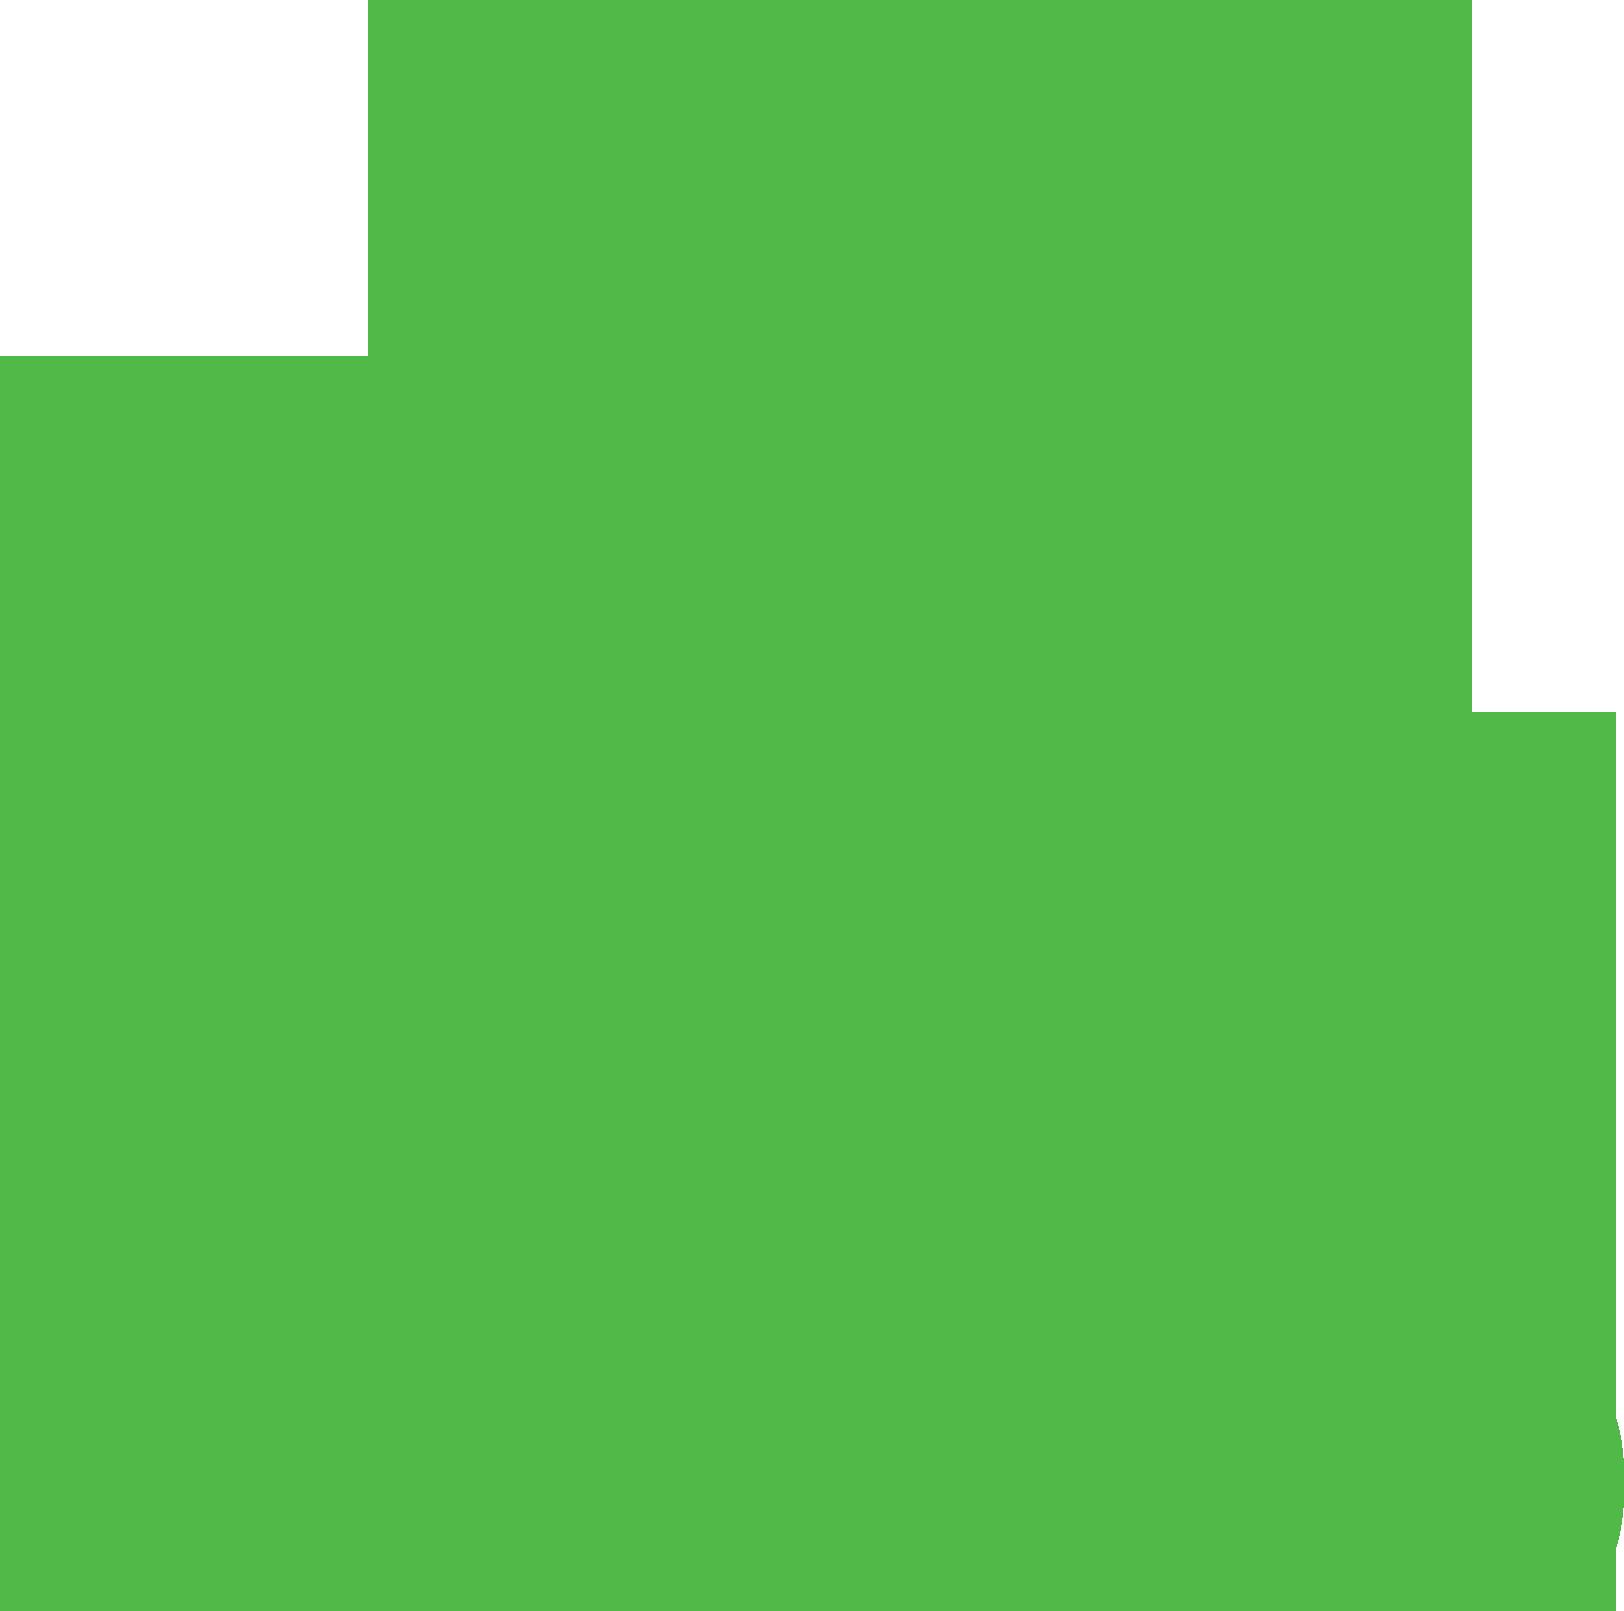 ameriglo-logo-new.png